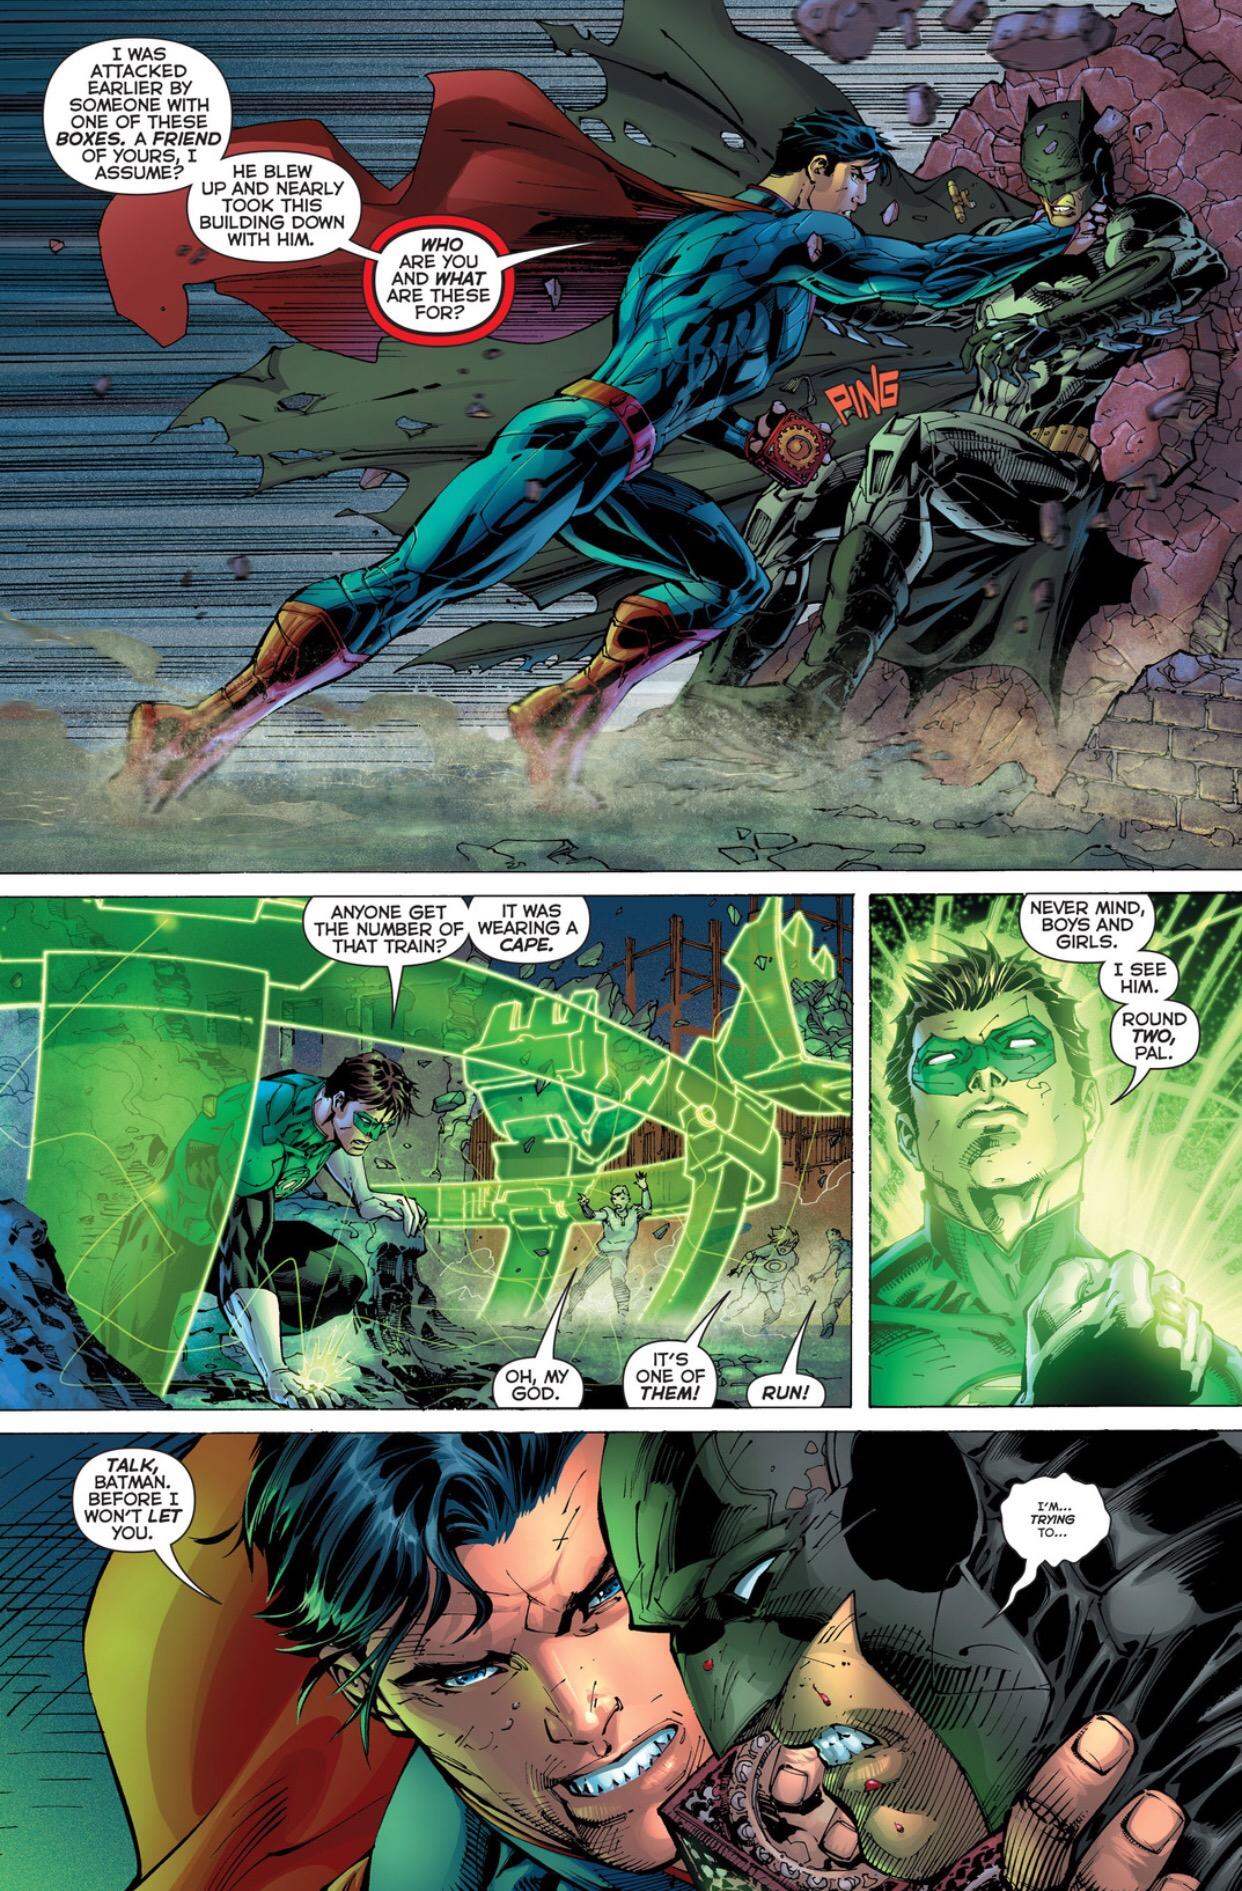 Superman vs green lantern - photo#16